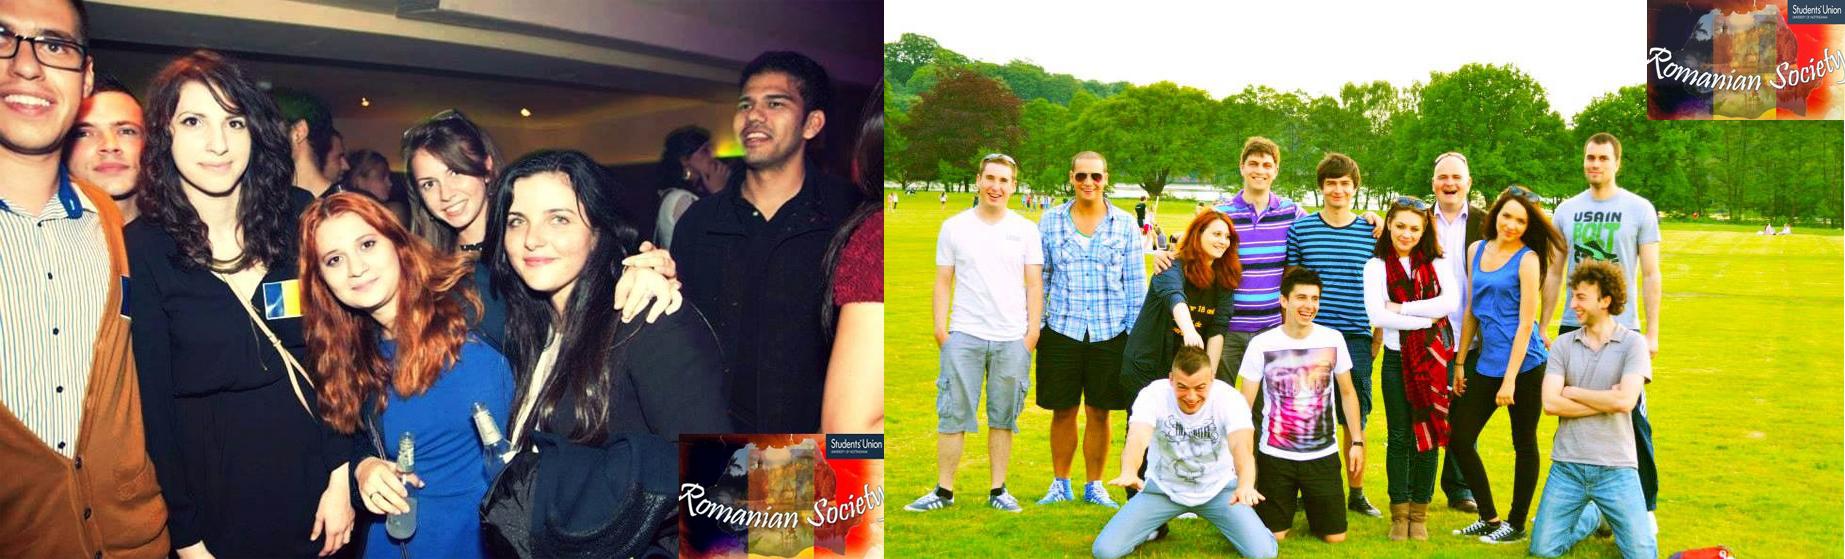 The Romanian Society enjoying life at Nottingham